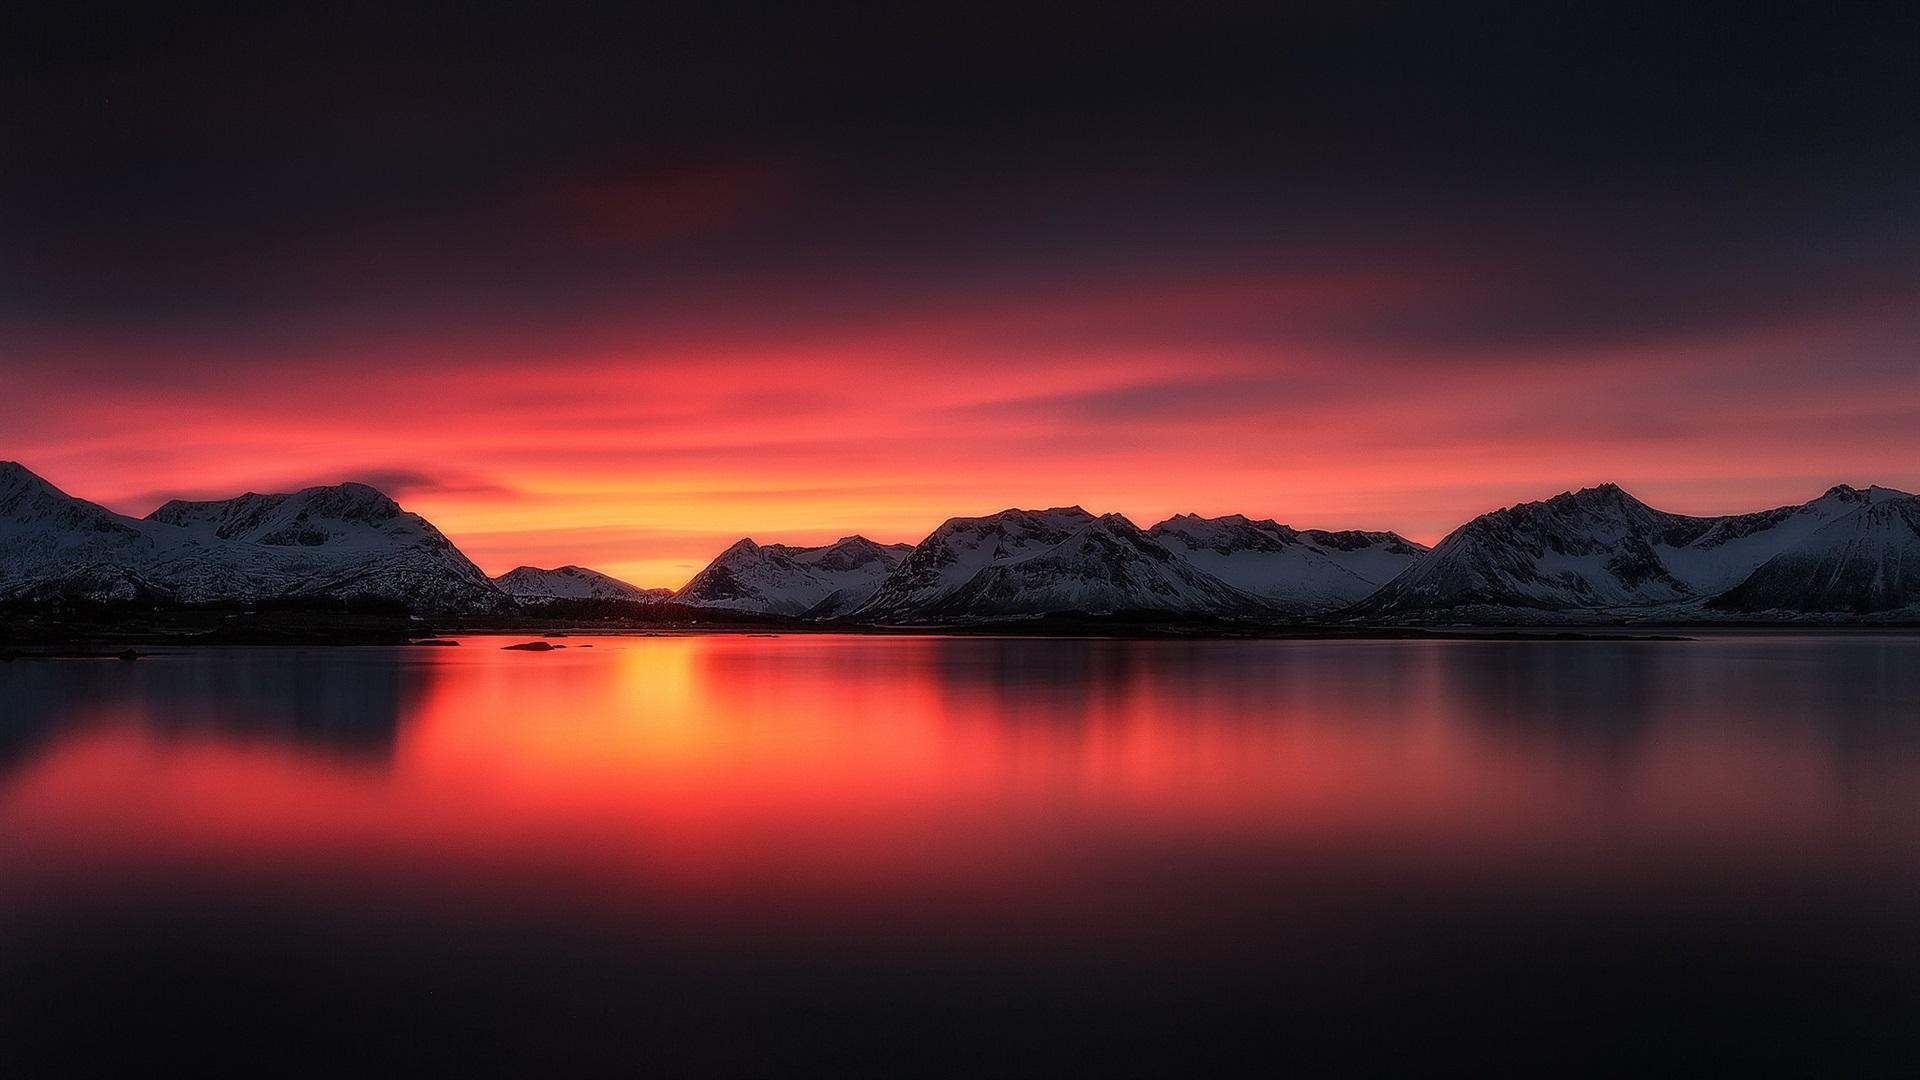 Wallpaper Beautiful Sunset Landscape Lake Red Sky